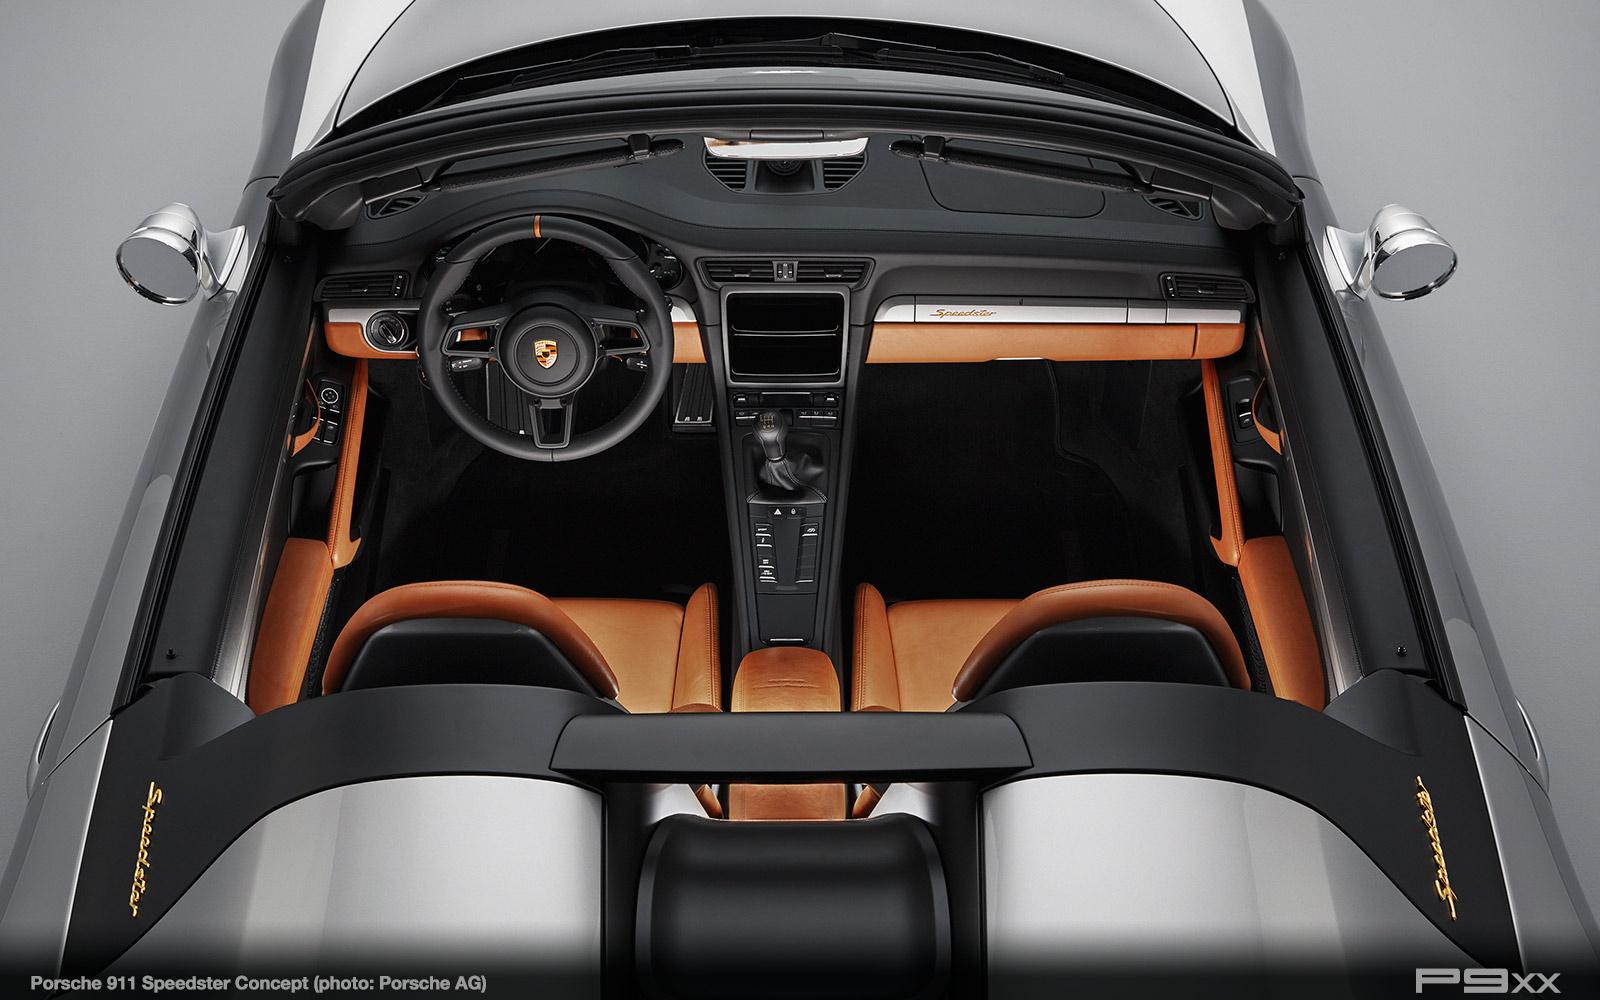 Porsche-911-Speedster-Concept-2018-311